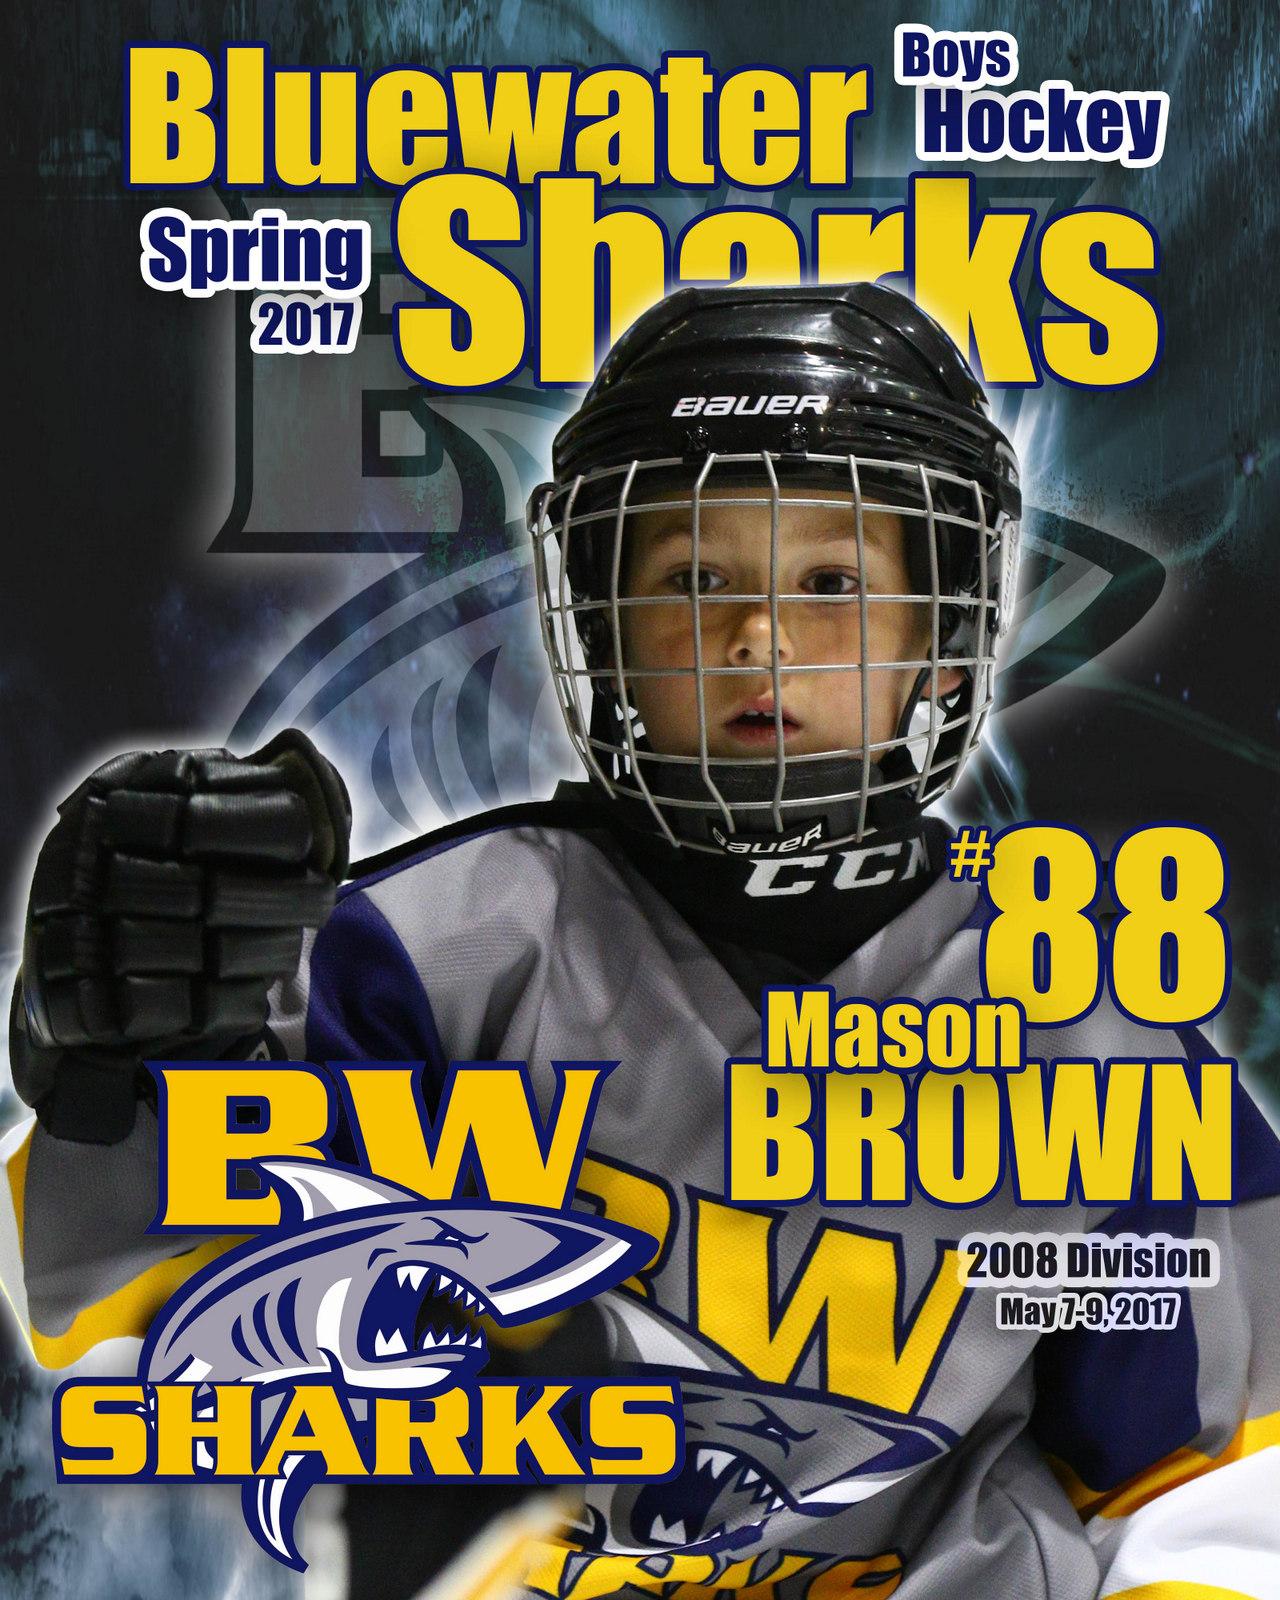 SilverPeak Studios Commemorative Poster Samples Action Sports Hockey Photography (12)